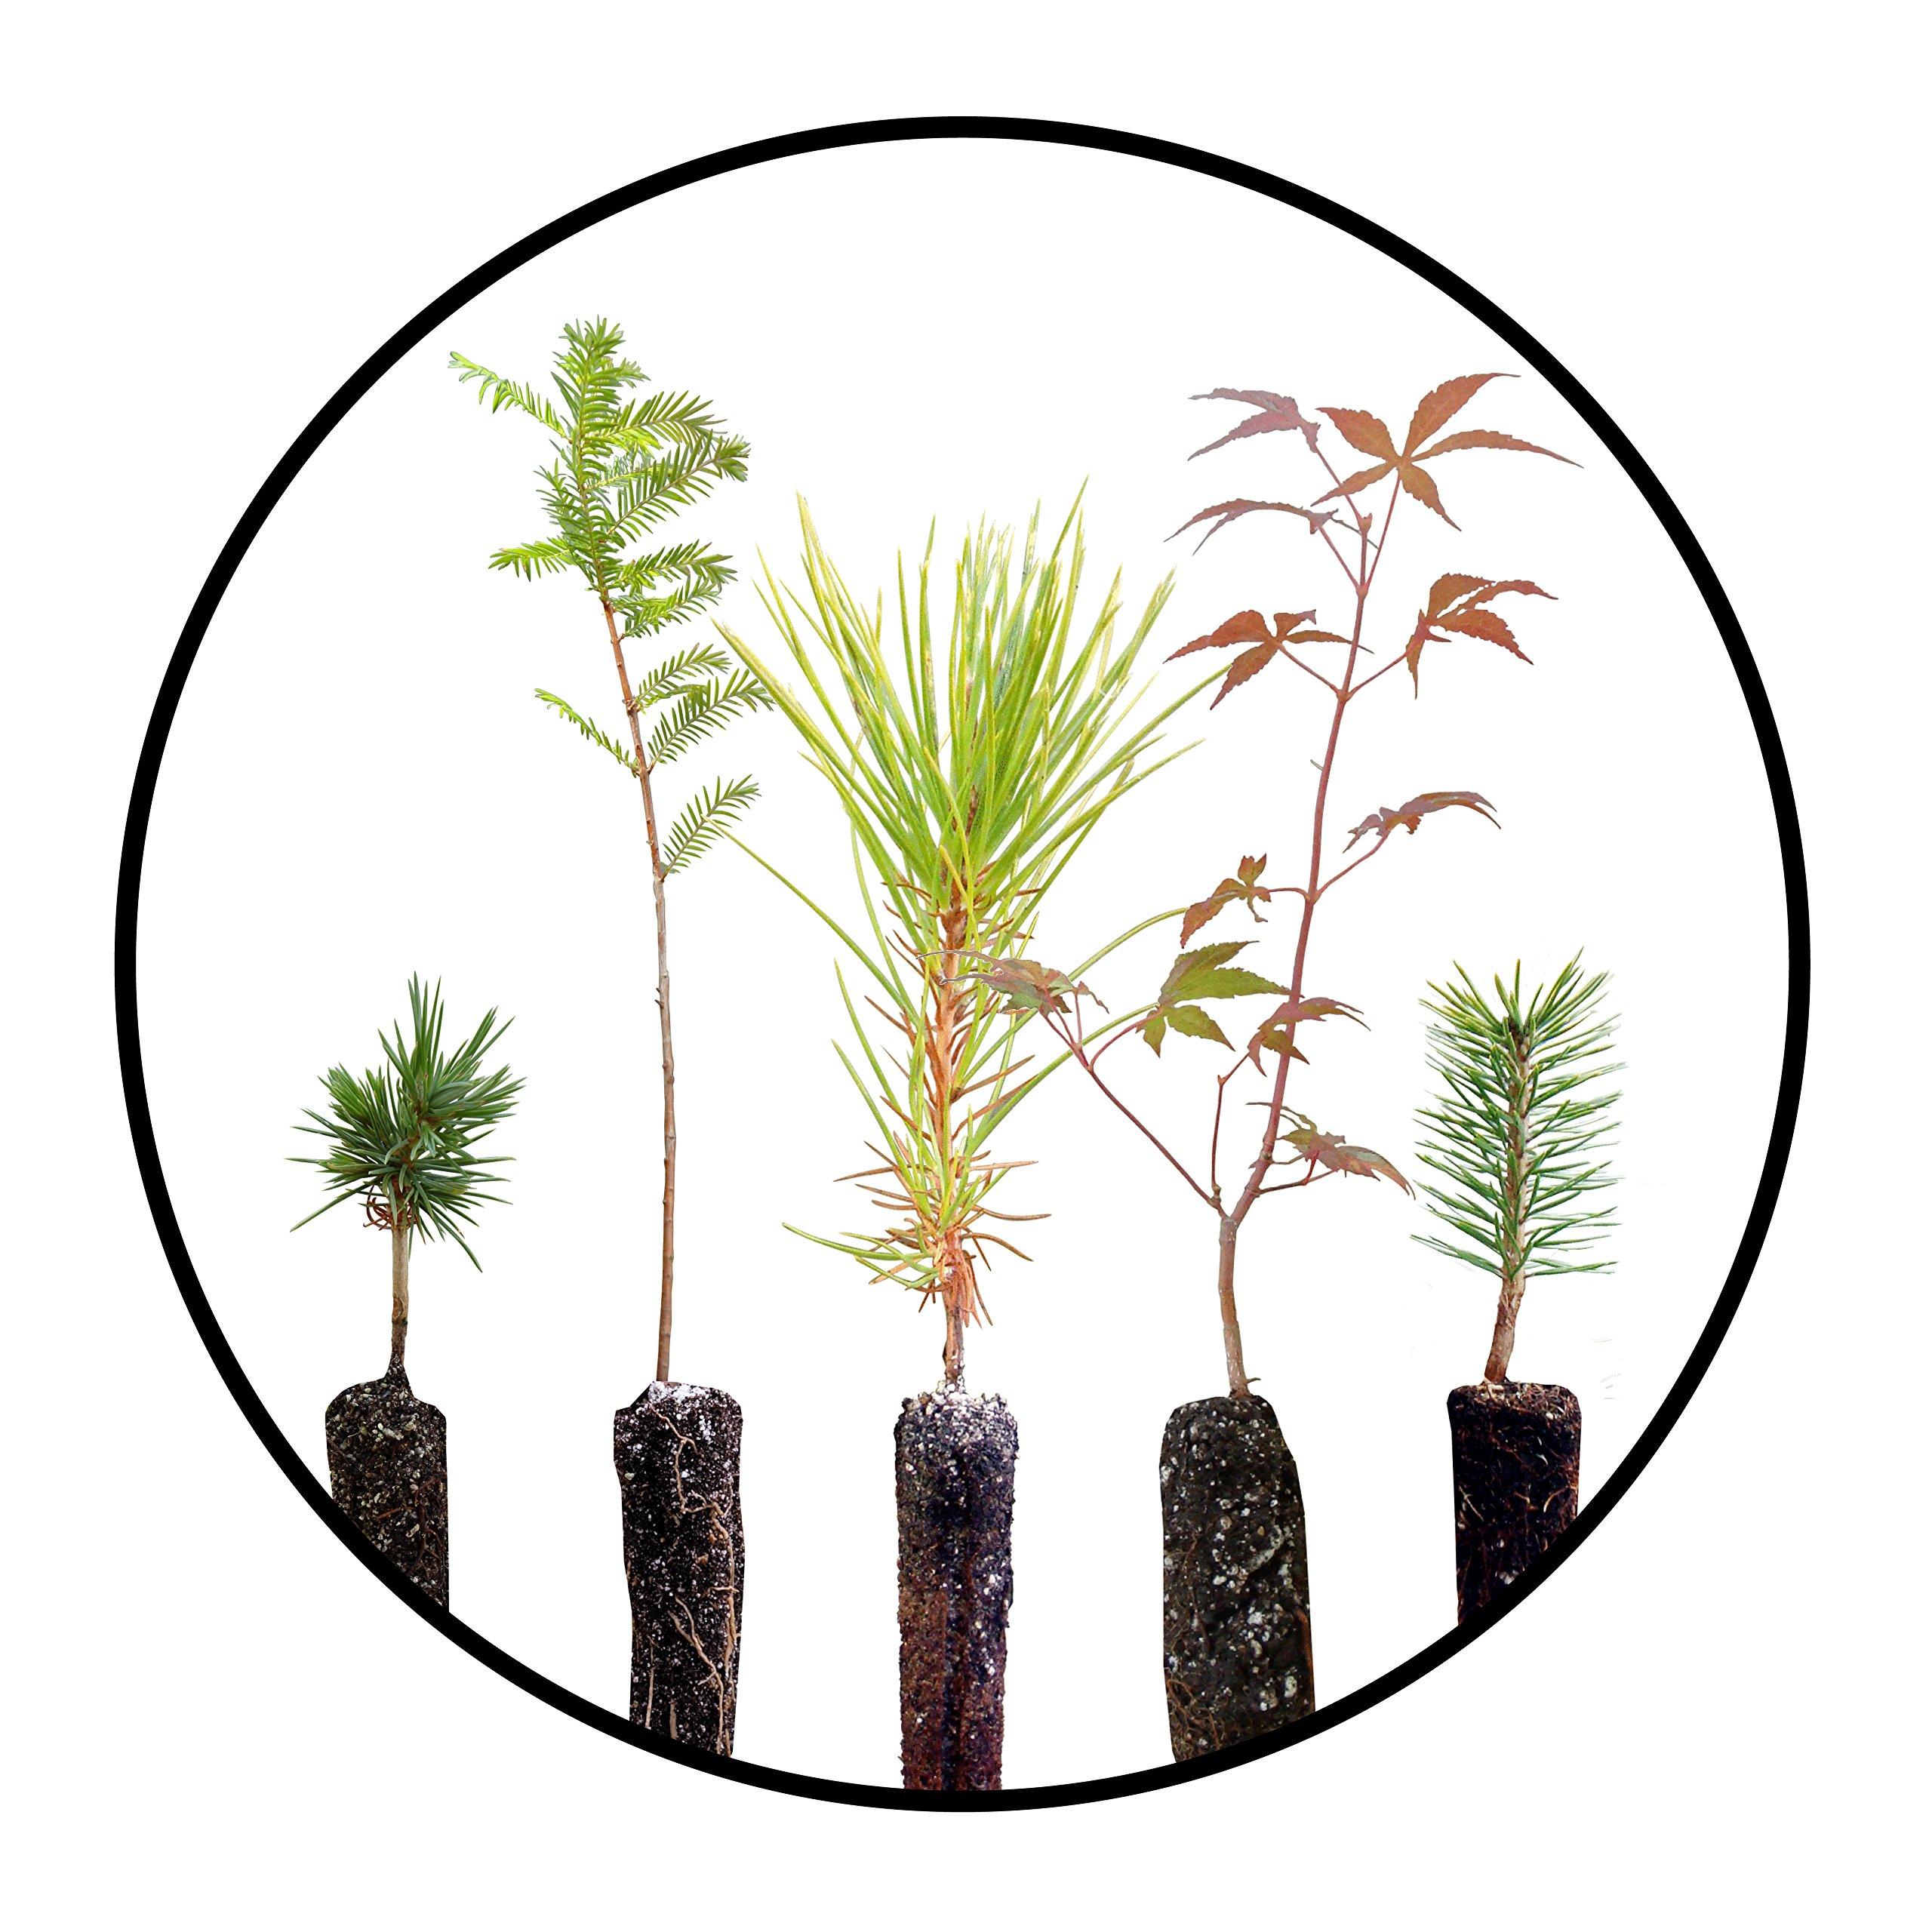 Bonsai Tree Bundle | Collection of 5 Live Tree Seedlings | The Jonsteen Company